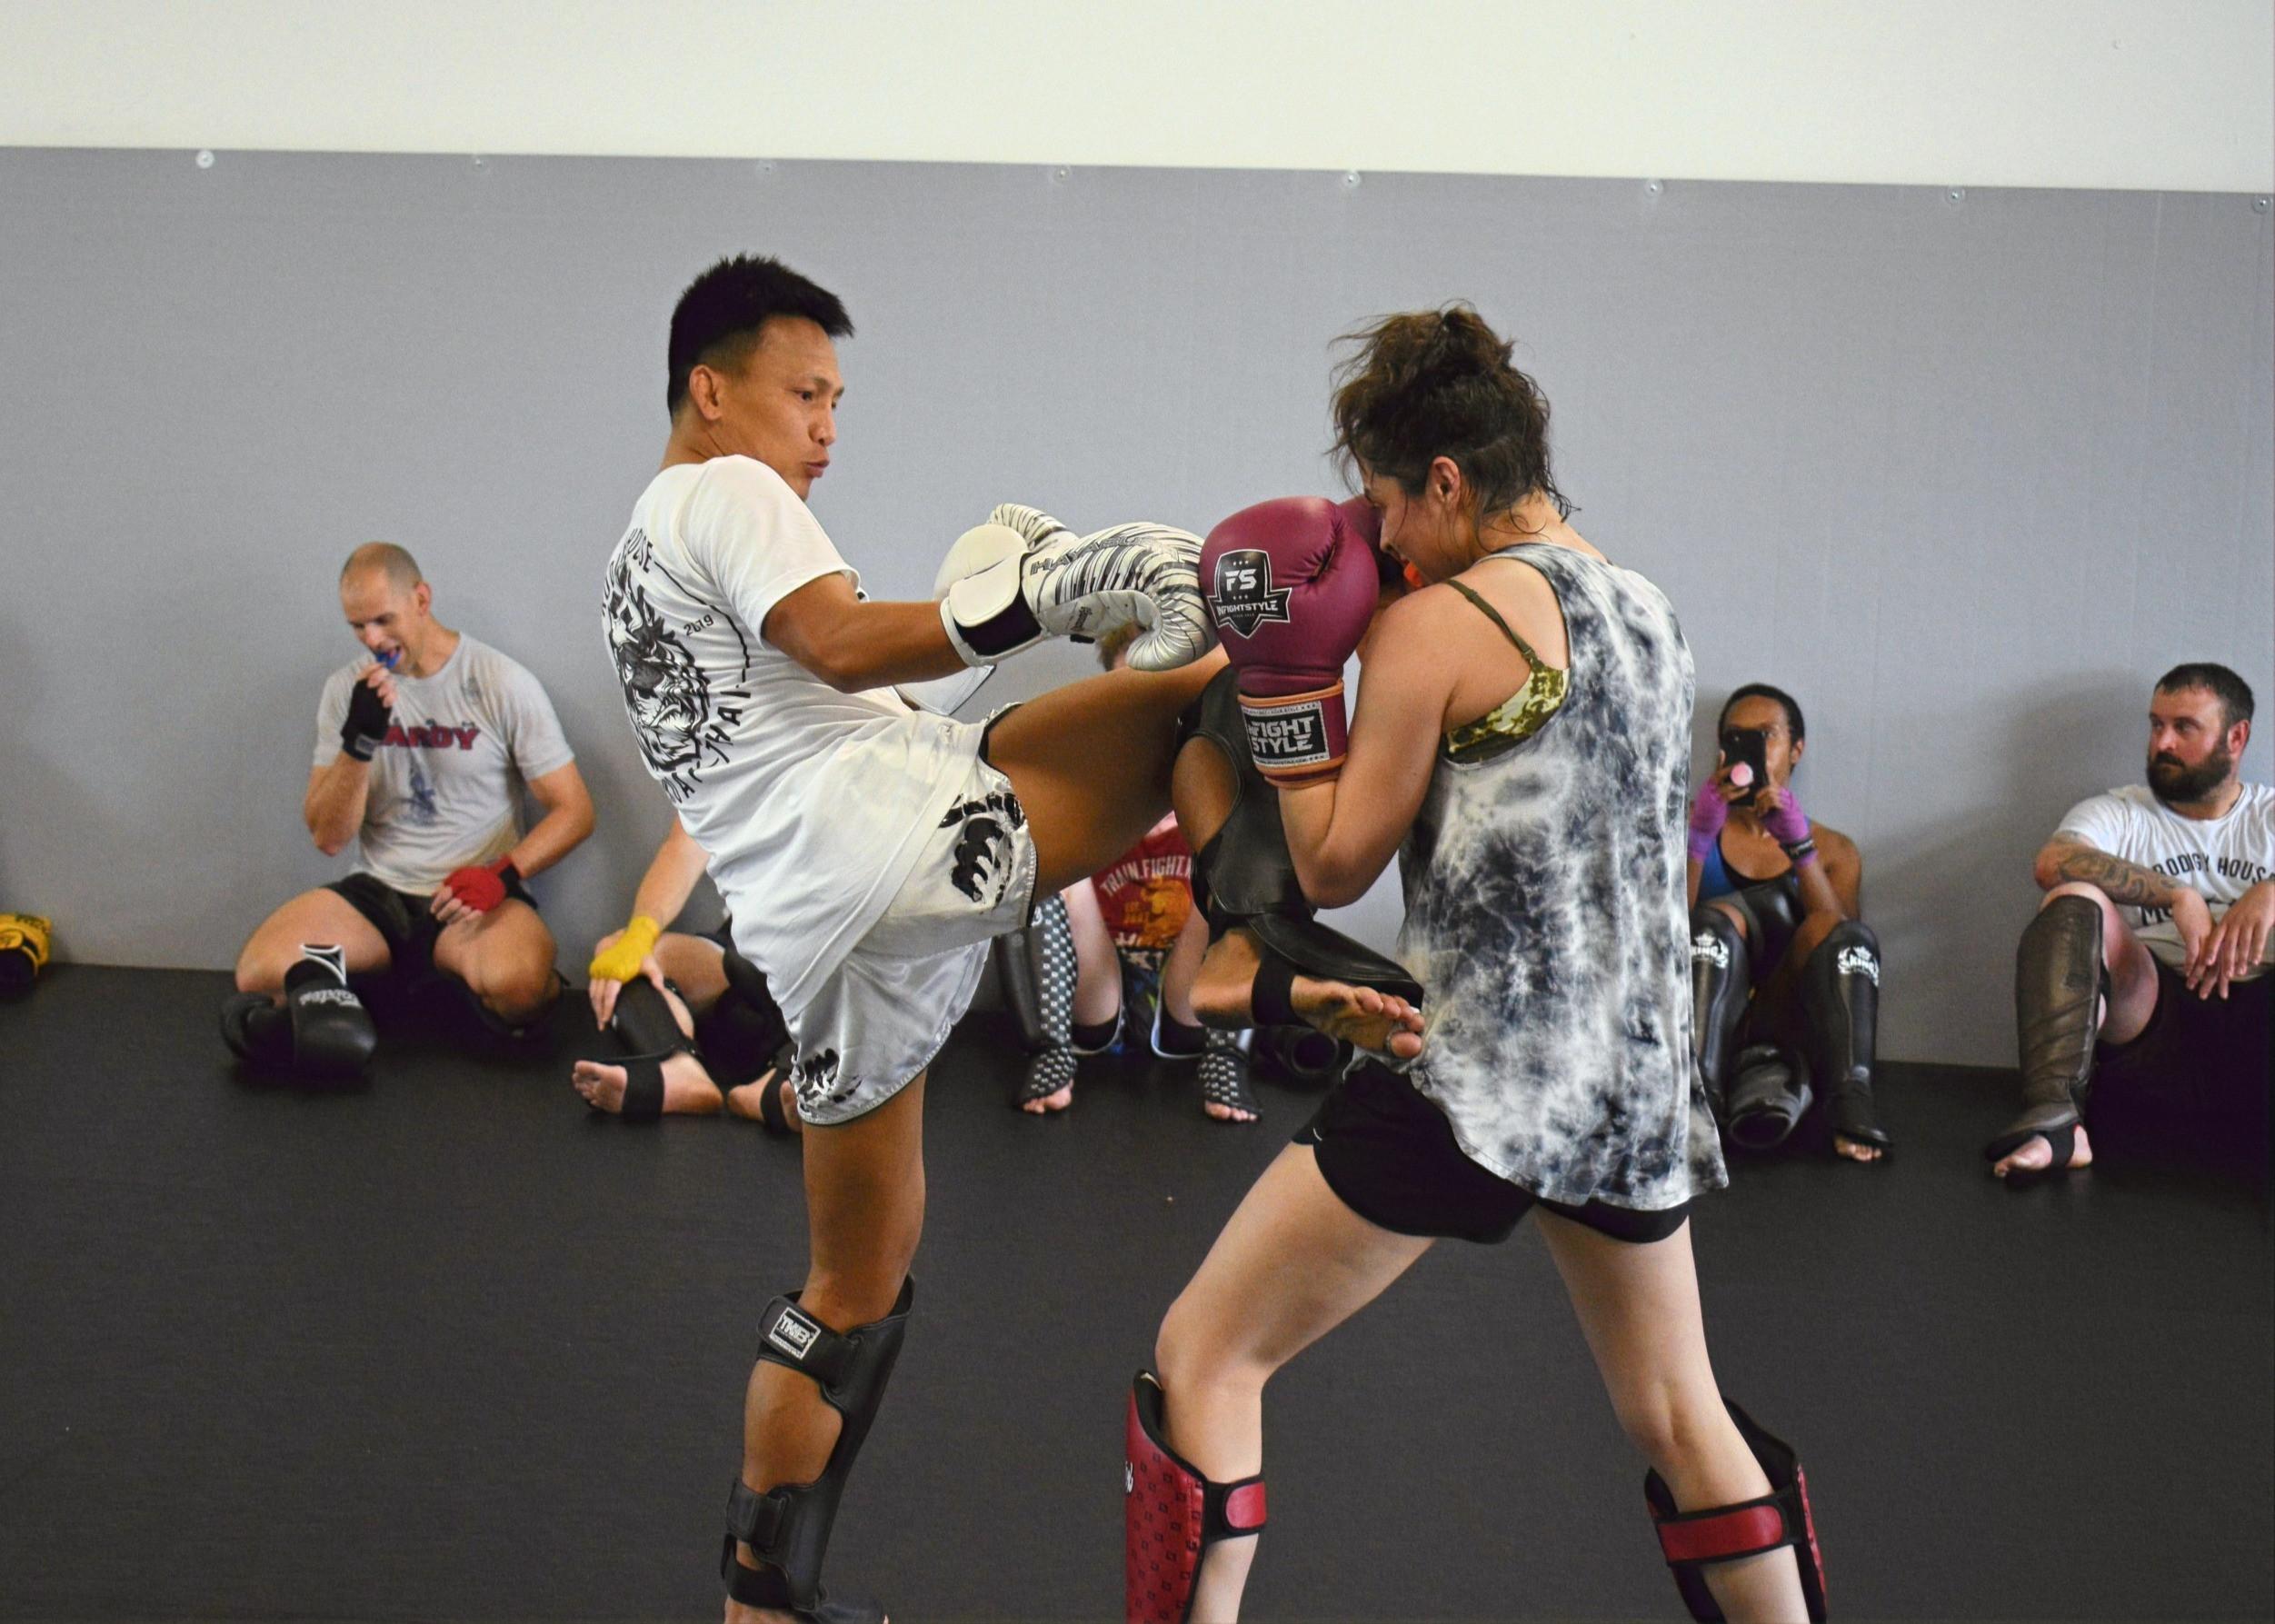 Striking for MMA